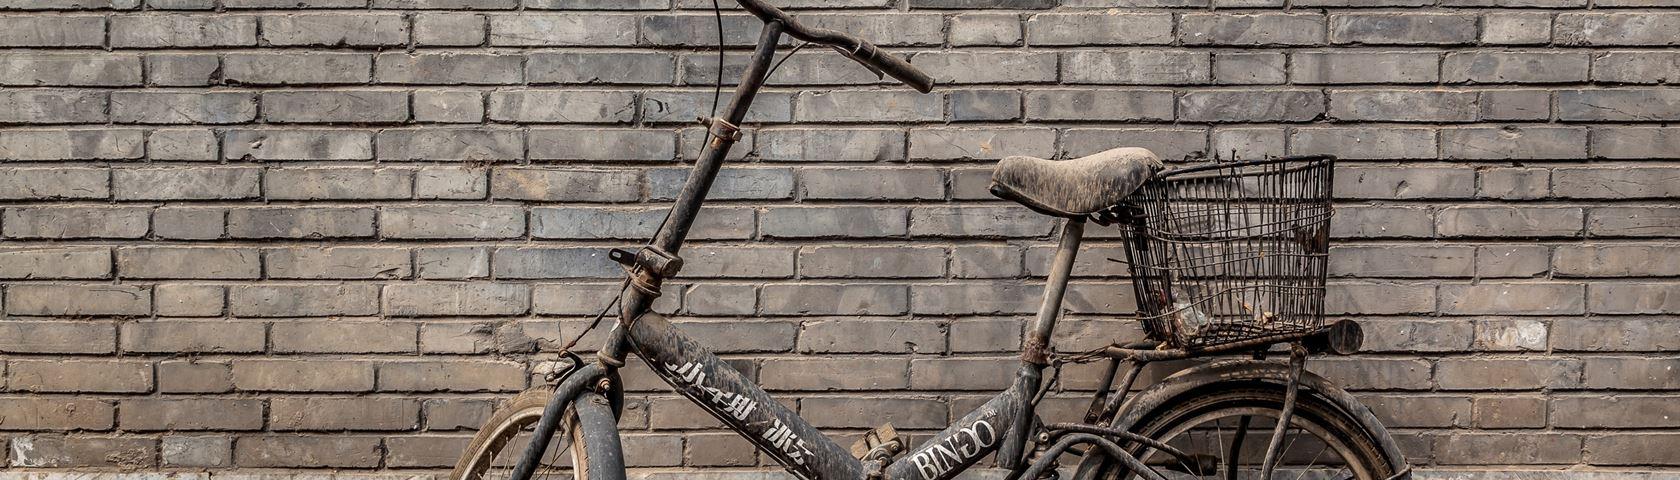 Old Rust Bike